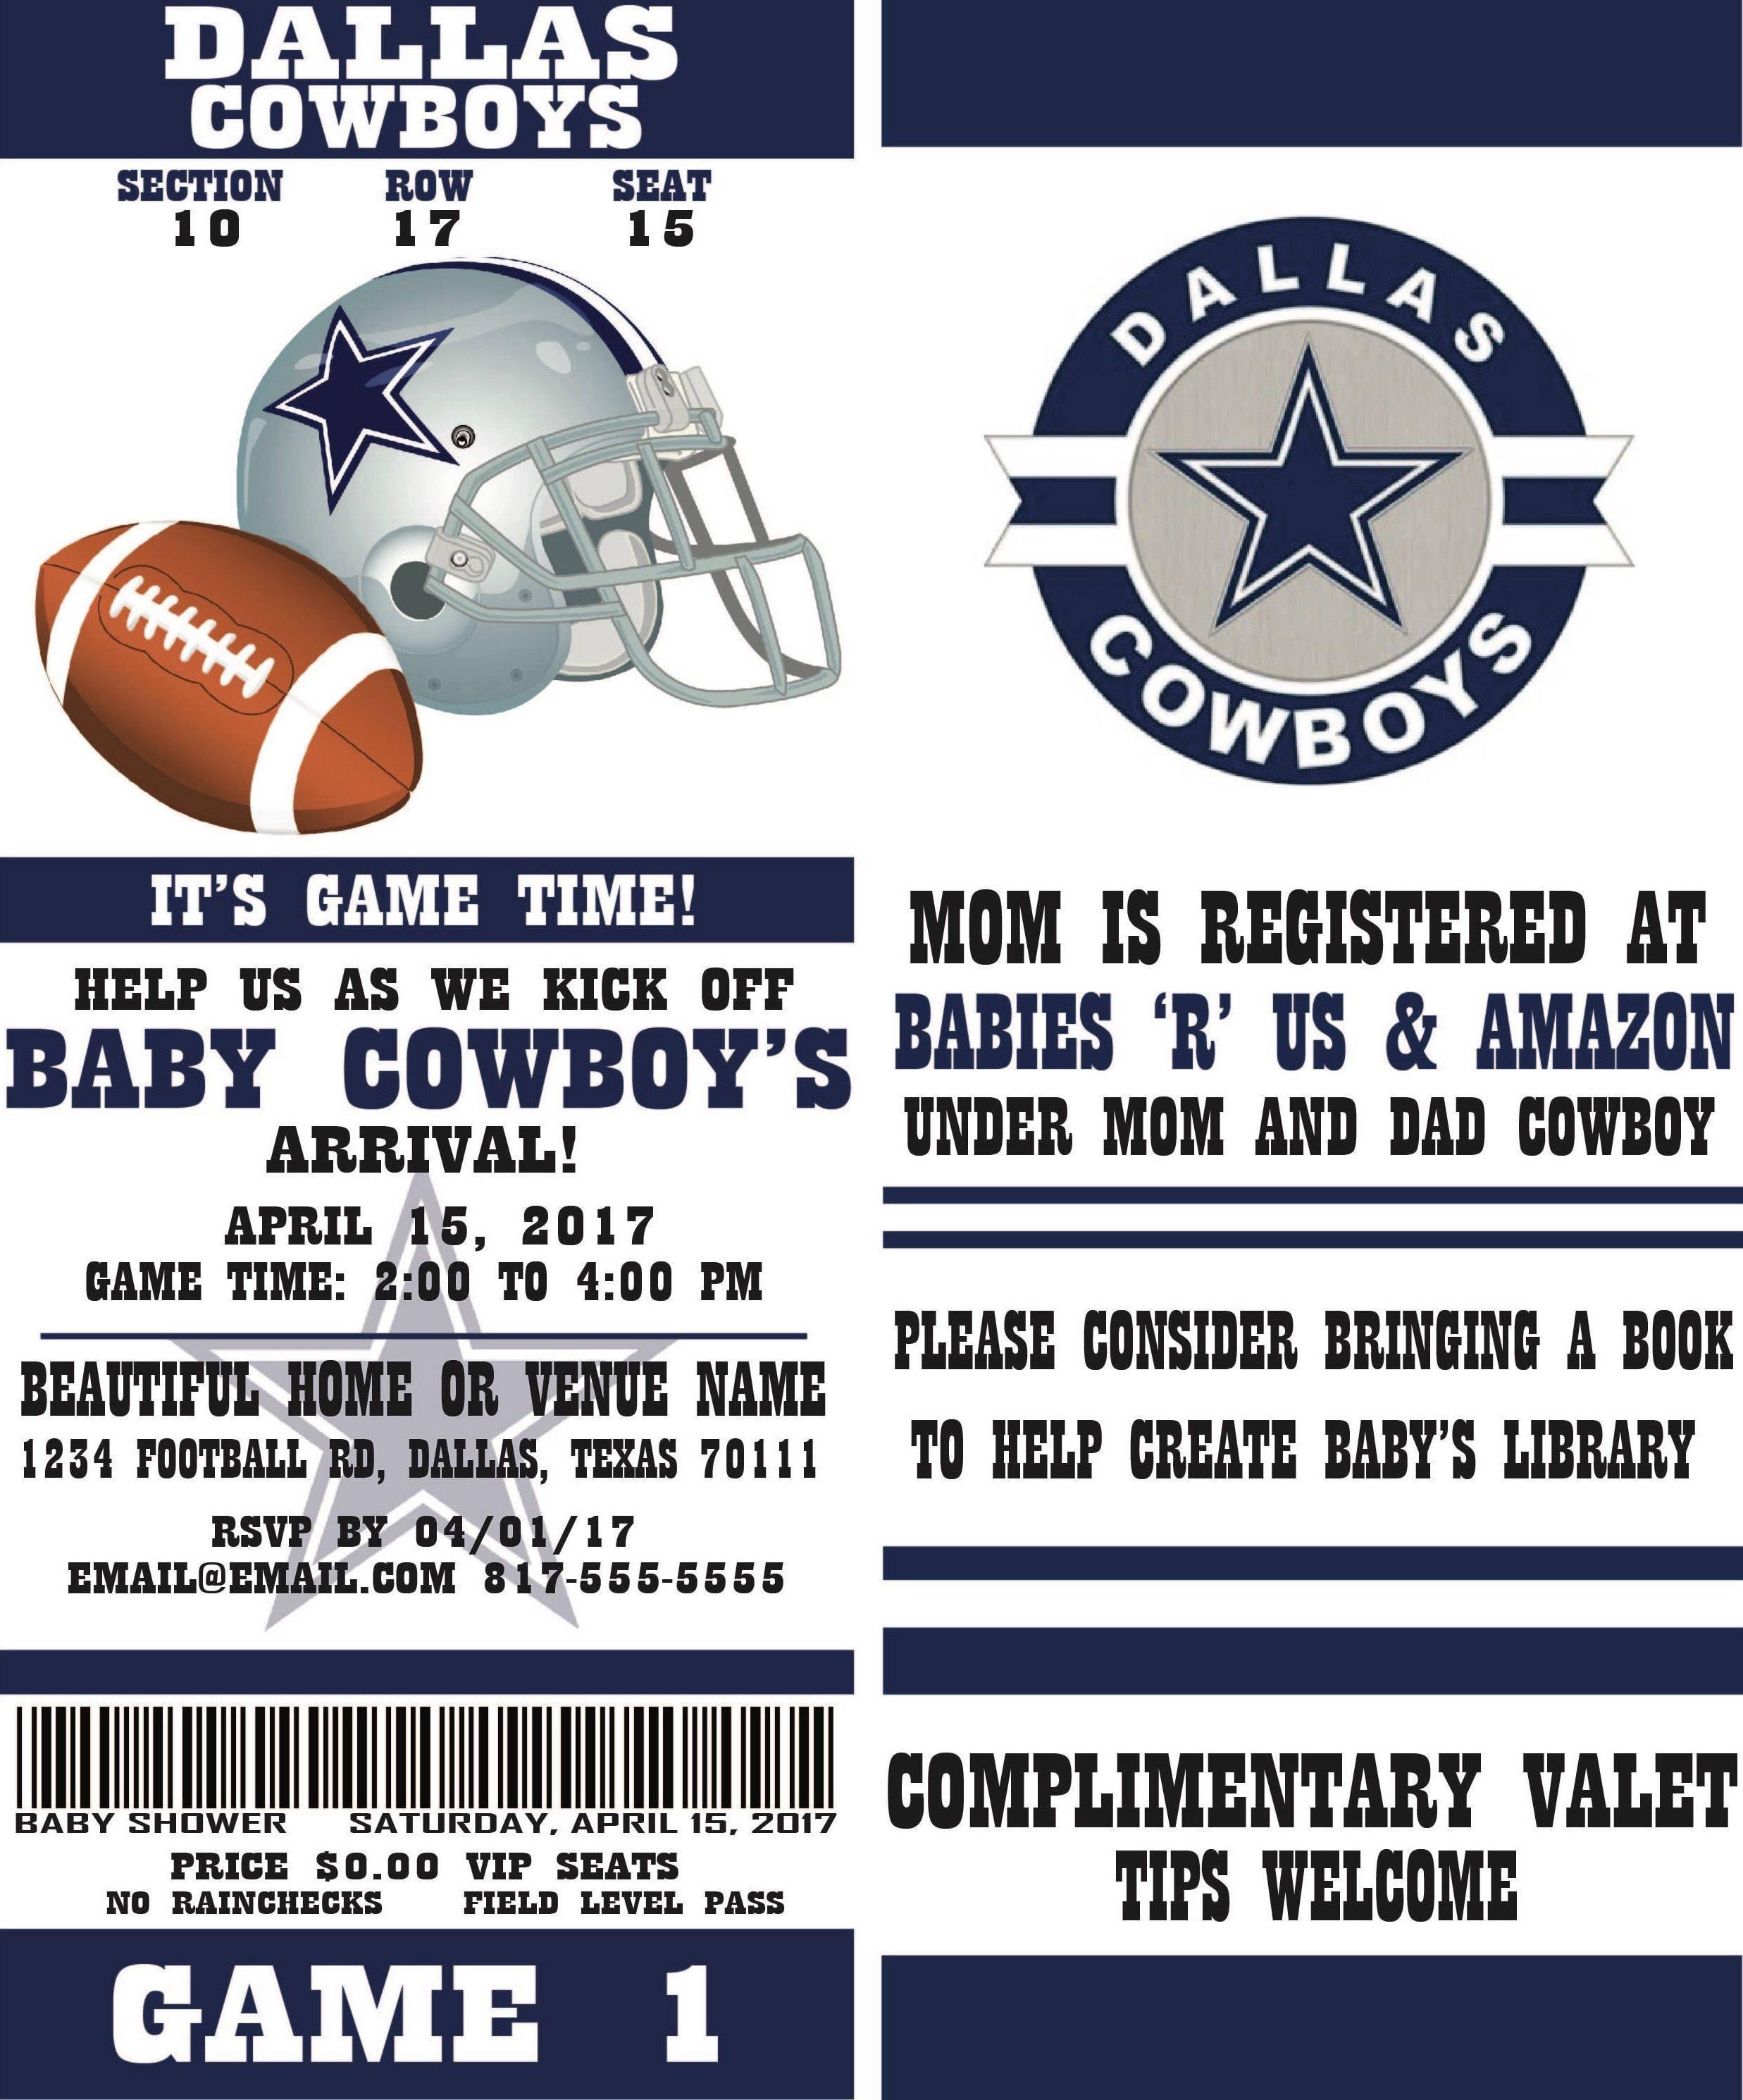 Football Ticket Party Invitation Dallas Cowboys Inspired